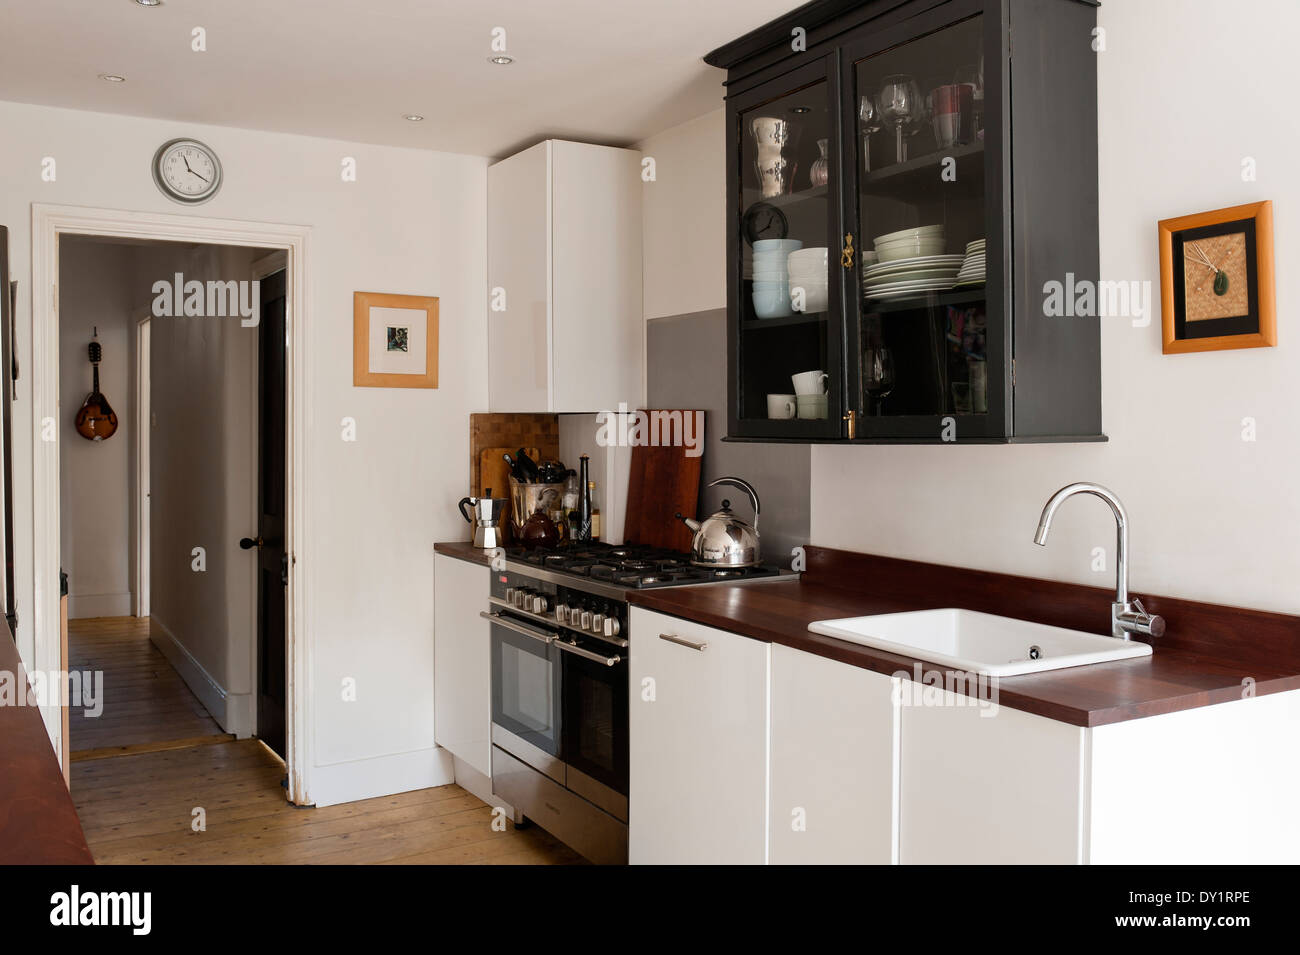 Ikea bianco unità base in cucina con riciclata Iroko di piani di ...